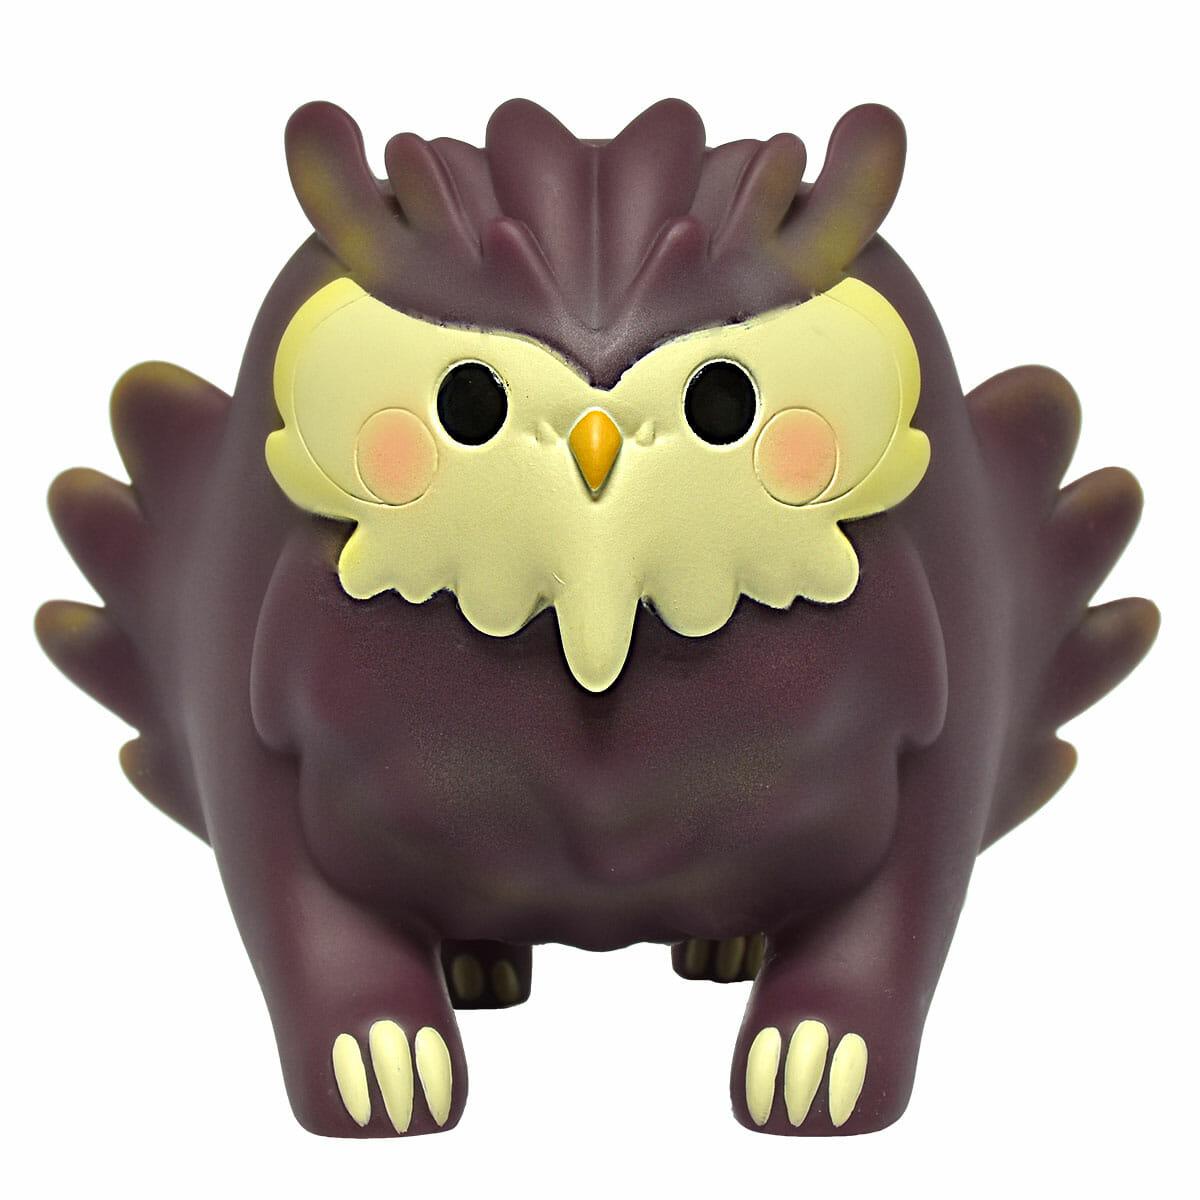 Adorable owlbear